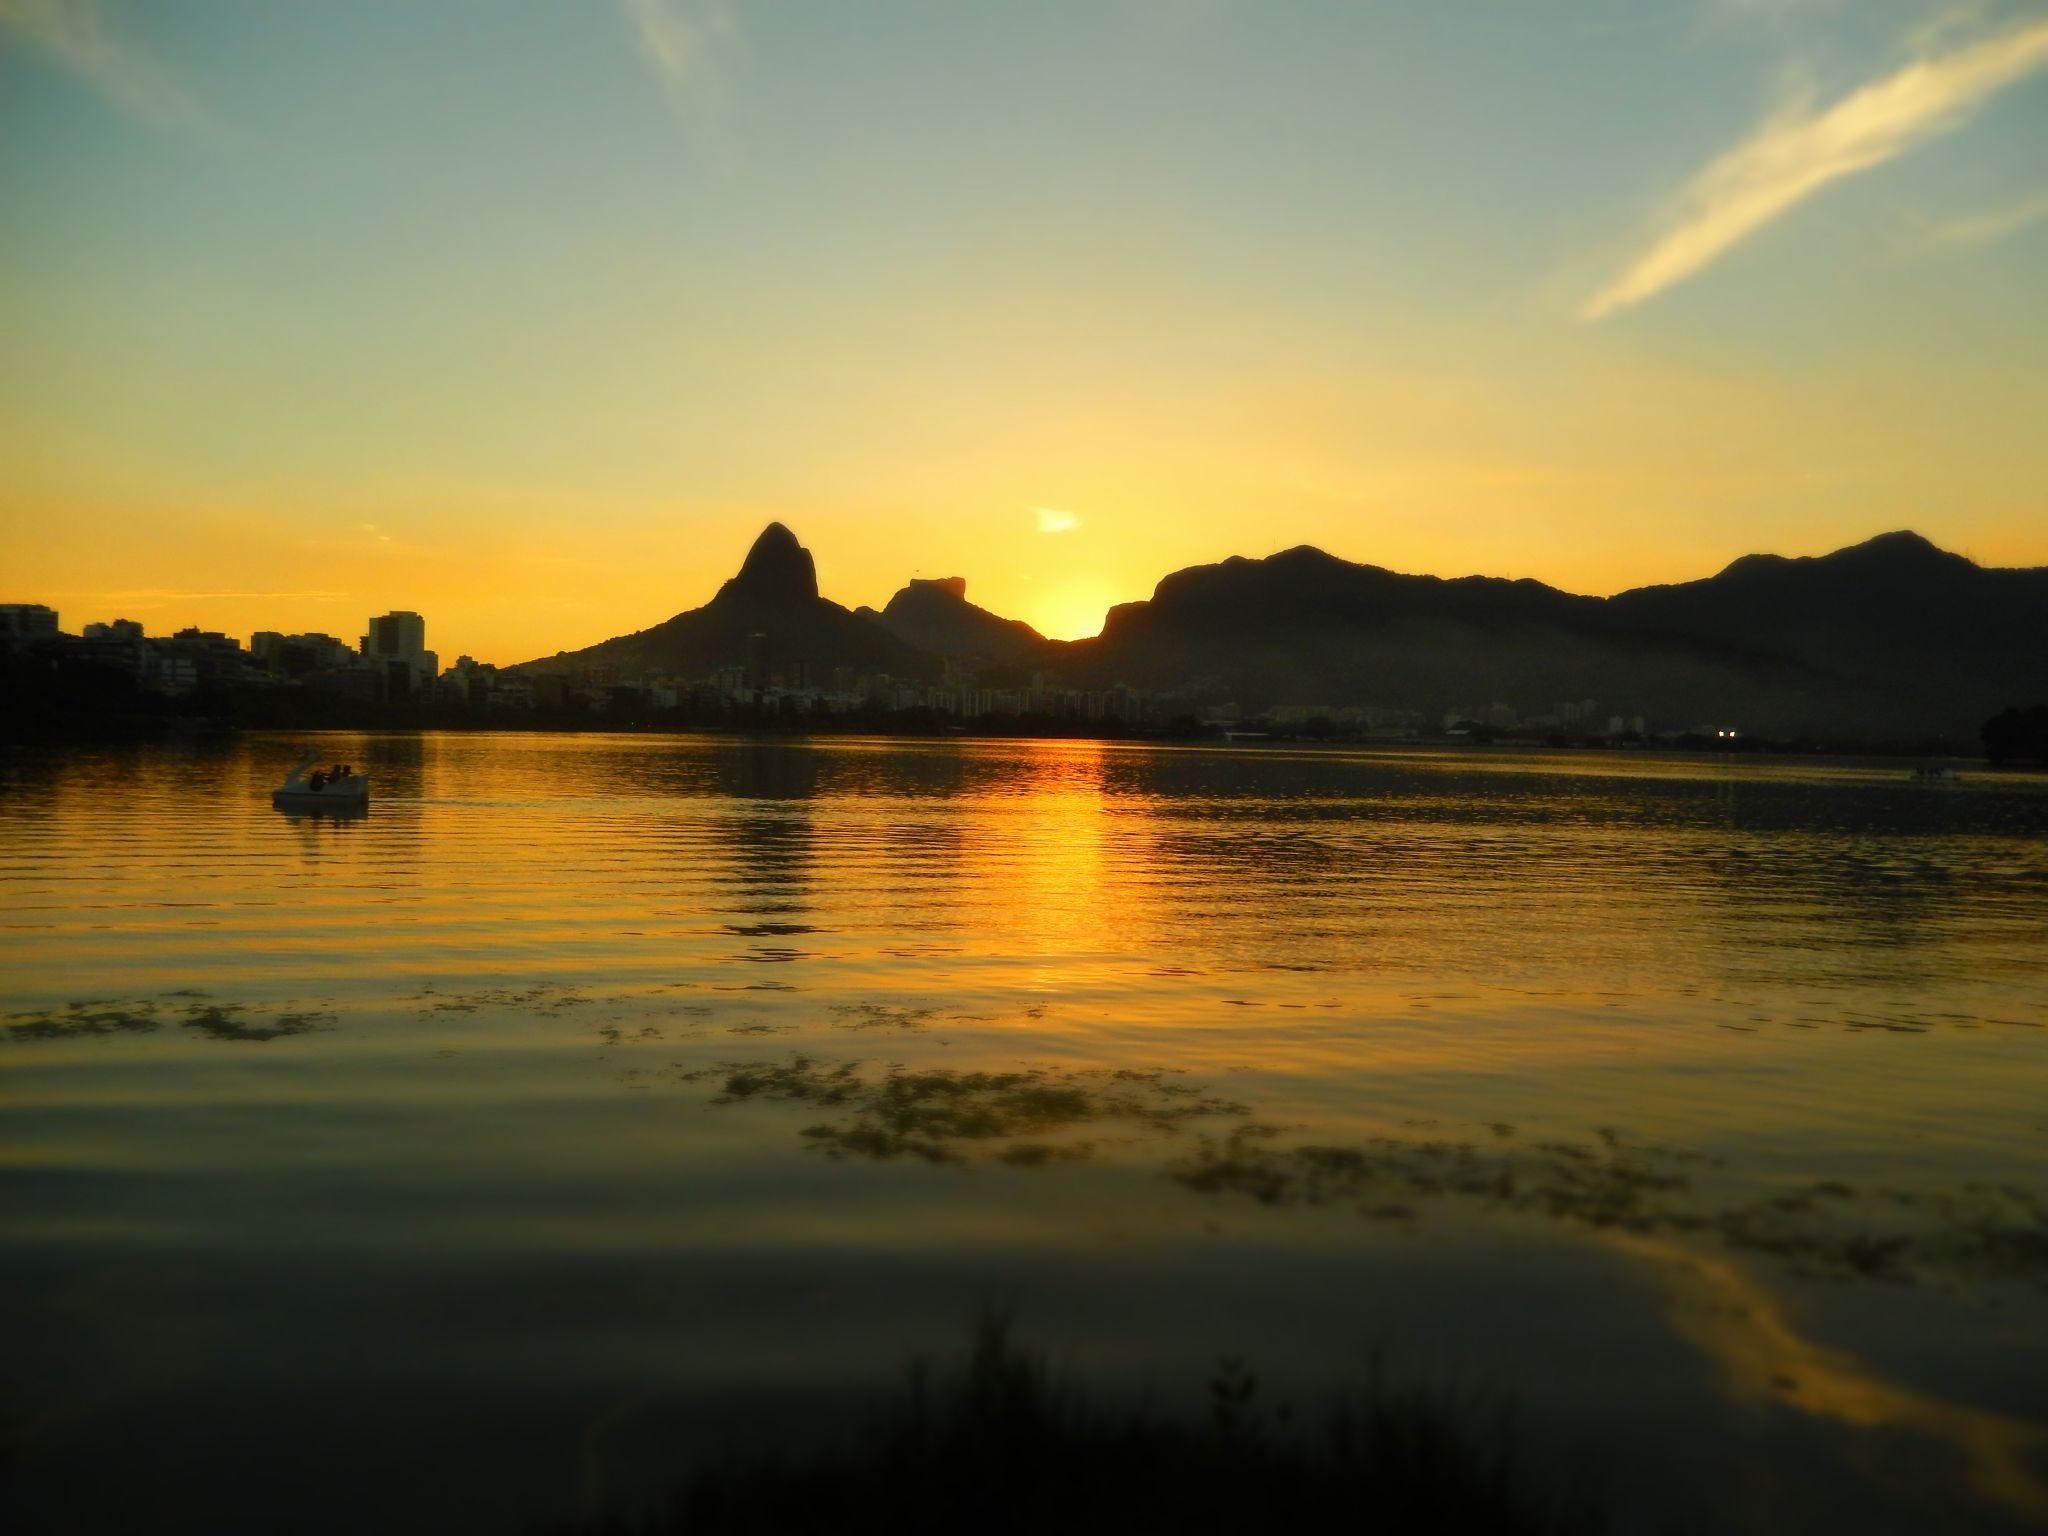 Ipanema Lago Rodrigas Freira Sunset